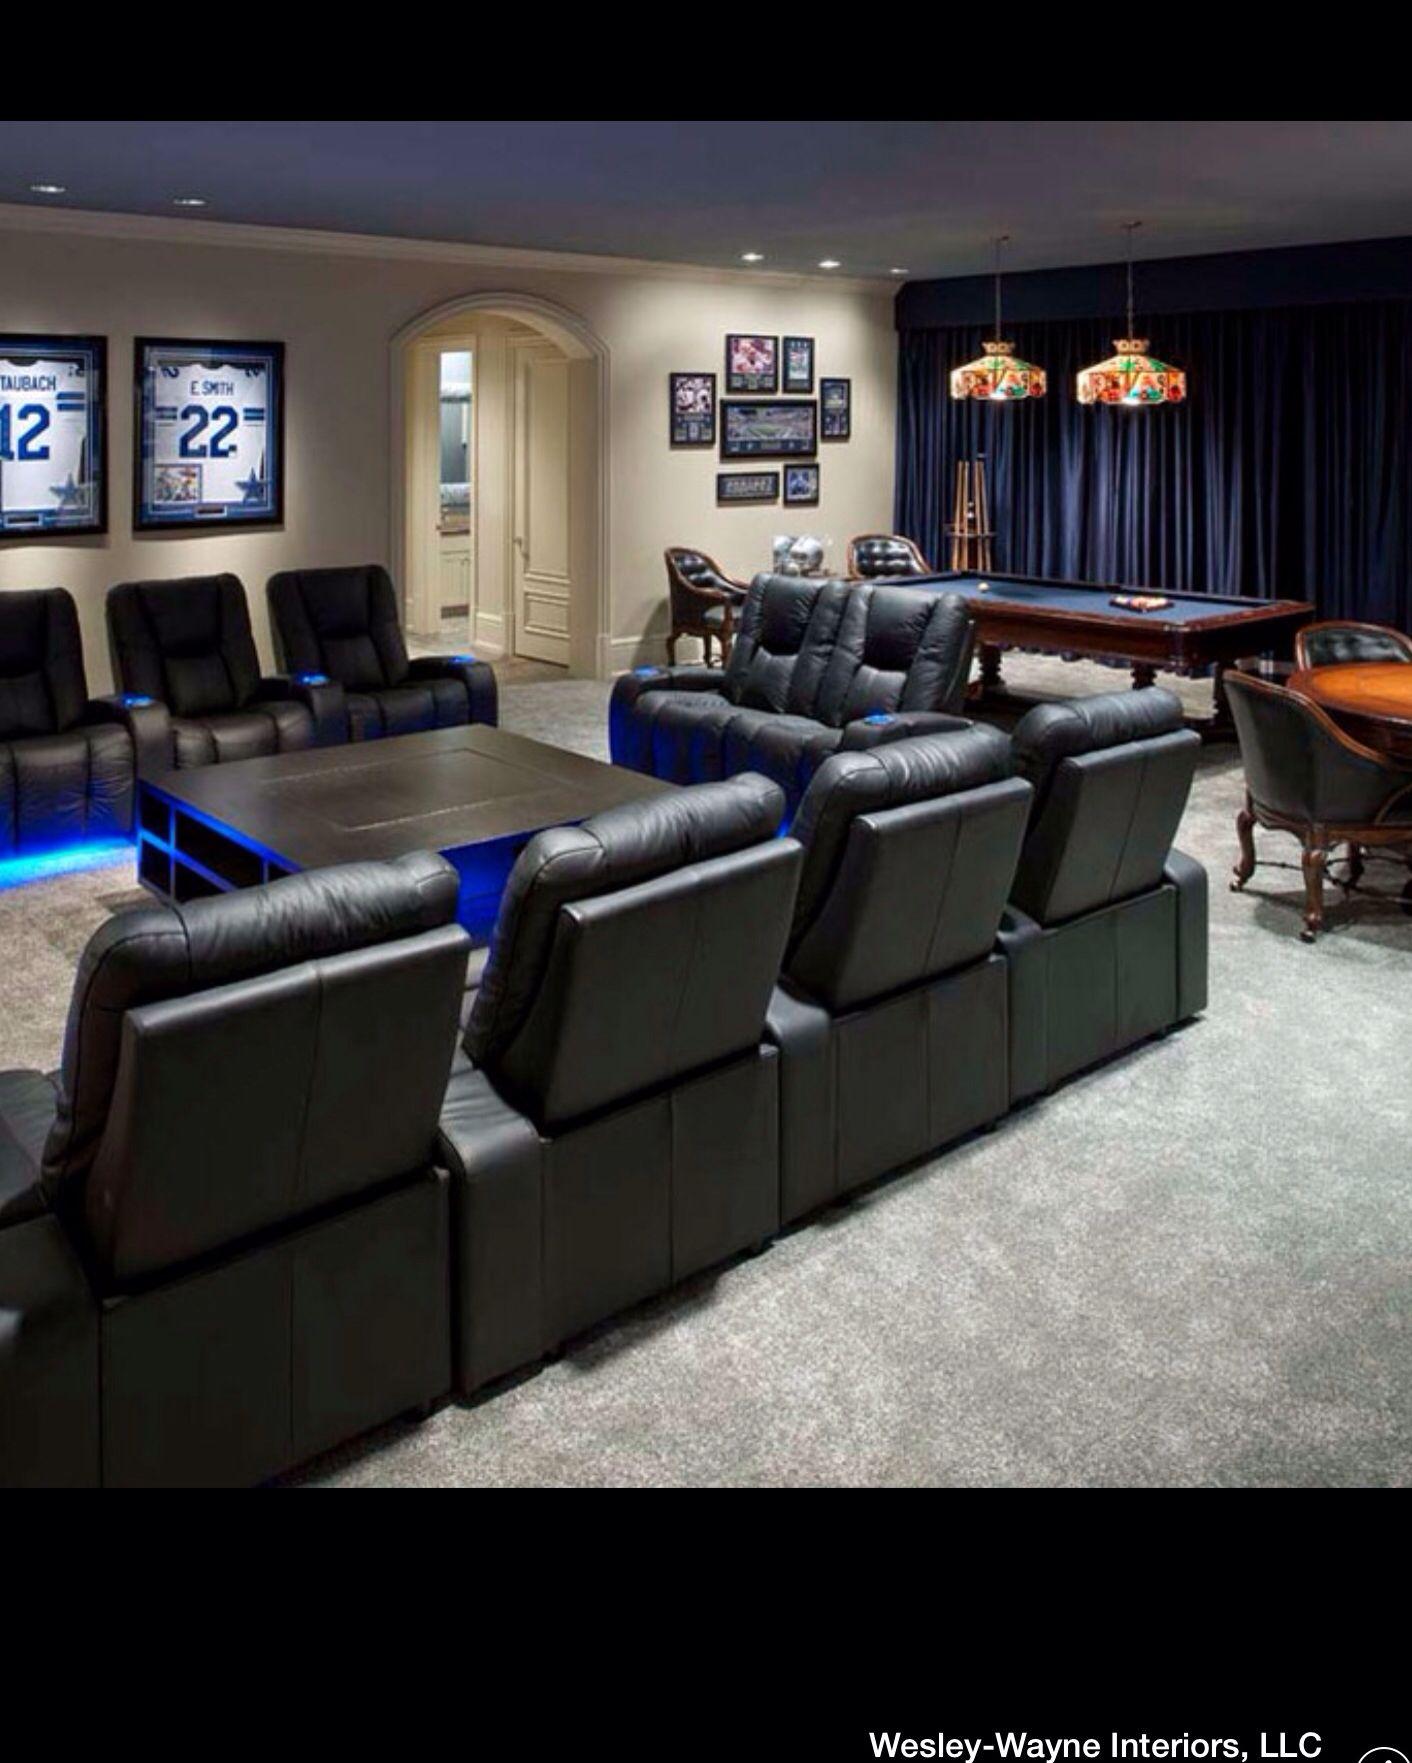 Your Very Own Dallas Cowboys Room Media Room Colors Cowboy Room Man Cave Home Bar